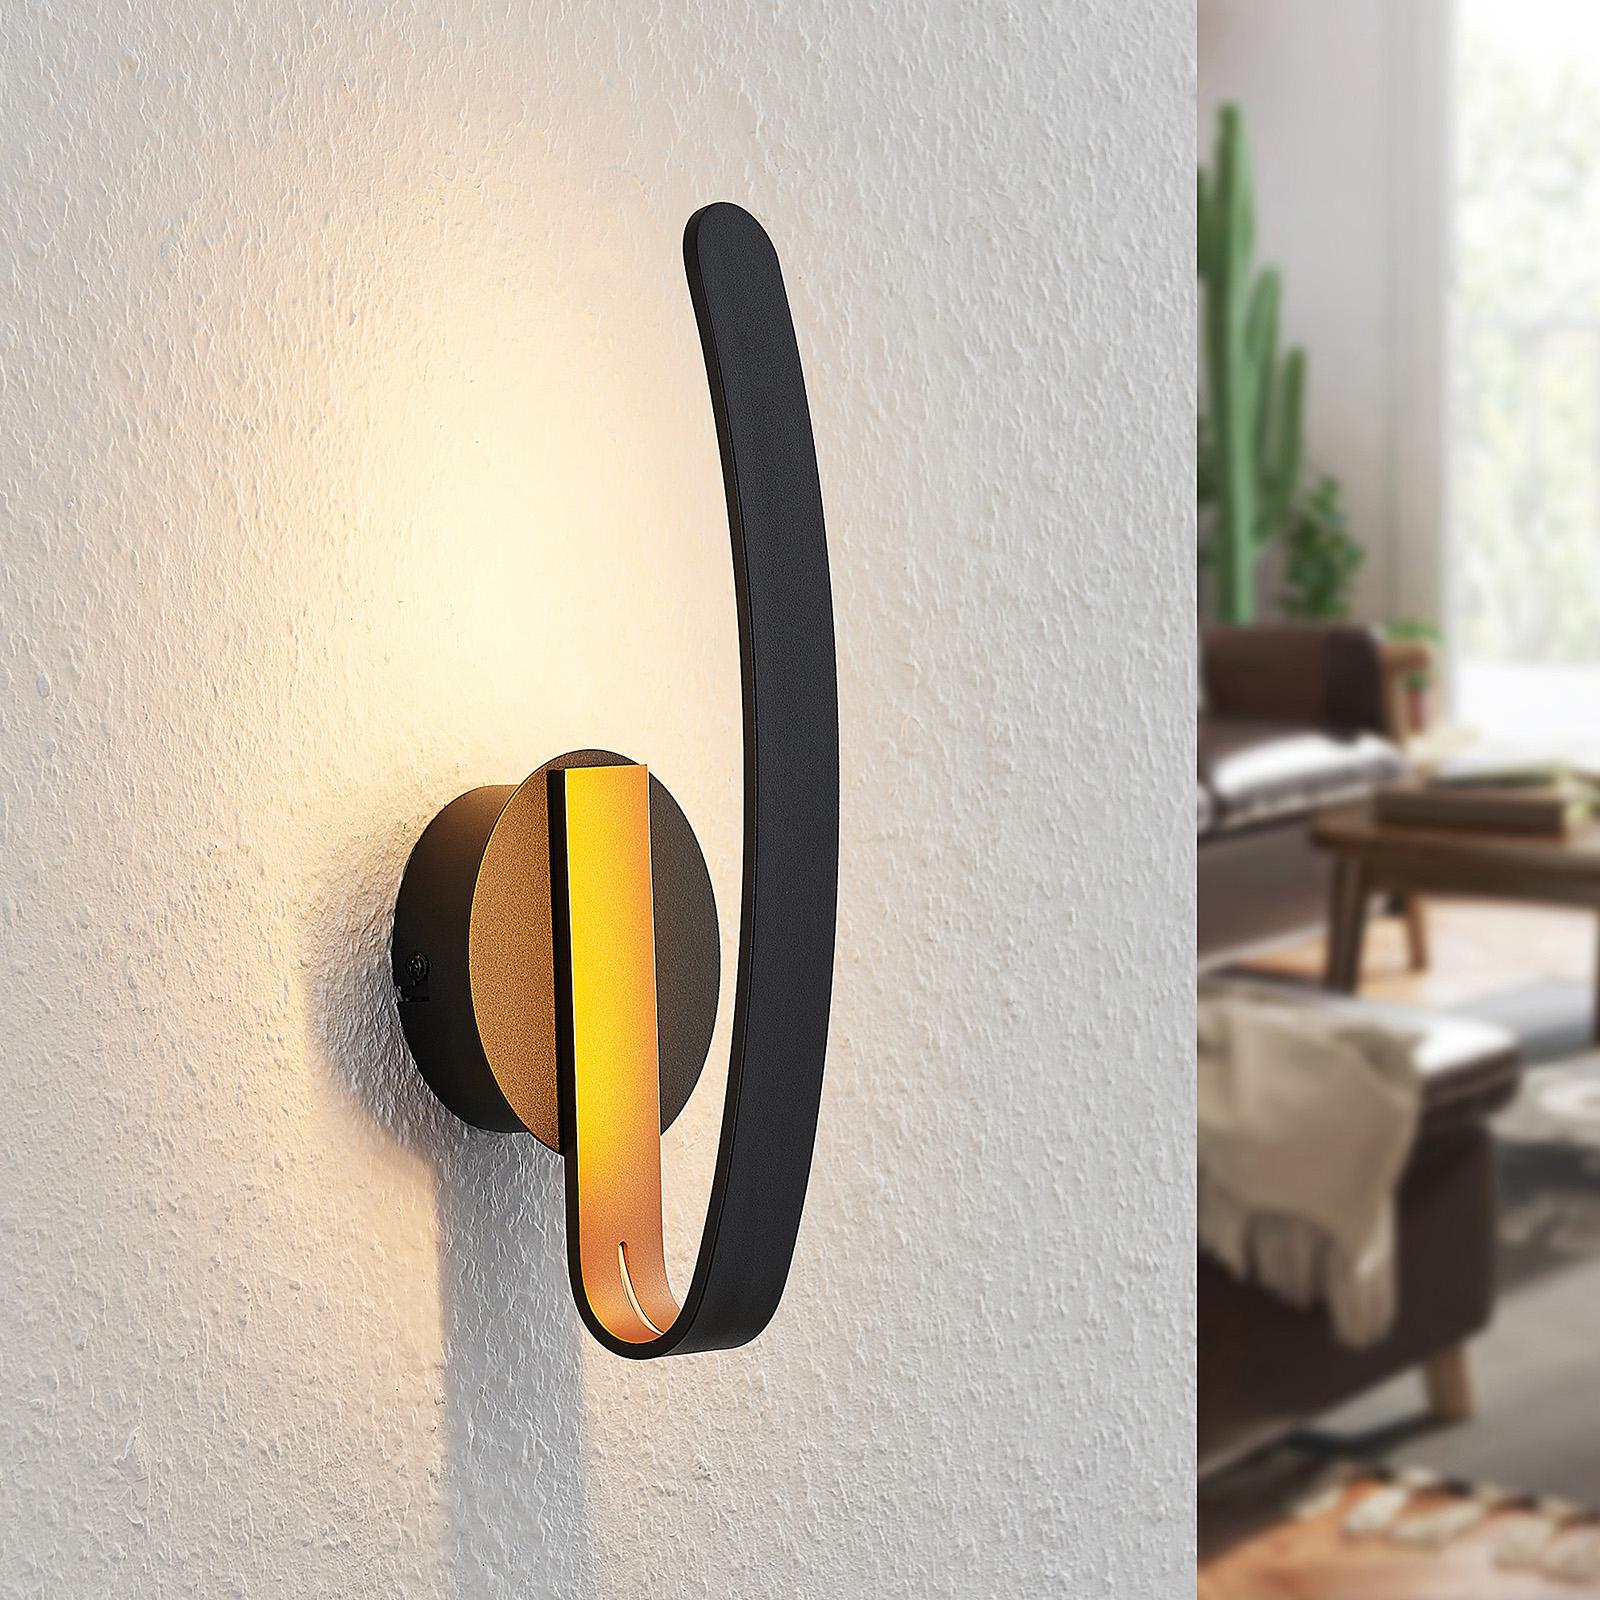 Arcchio Dzemail LED-Wandlampe, indirekt, schwarz